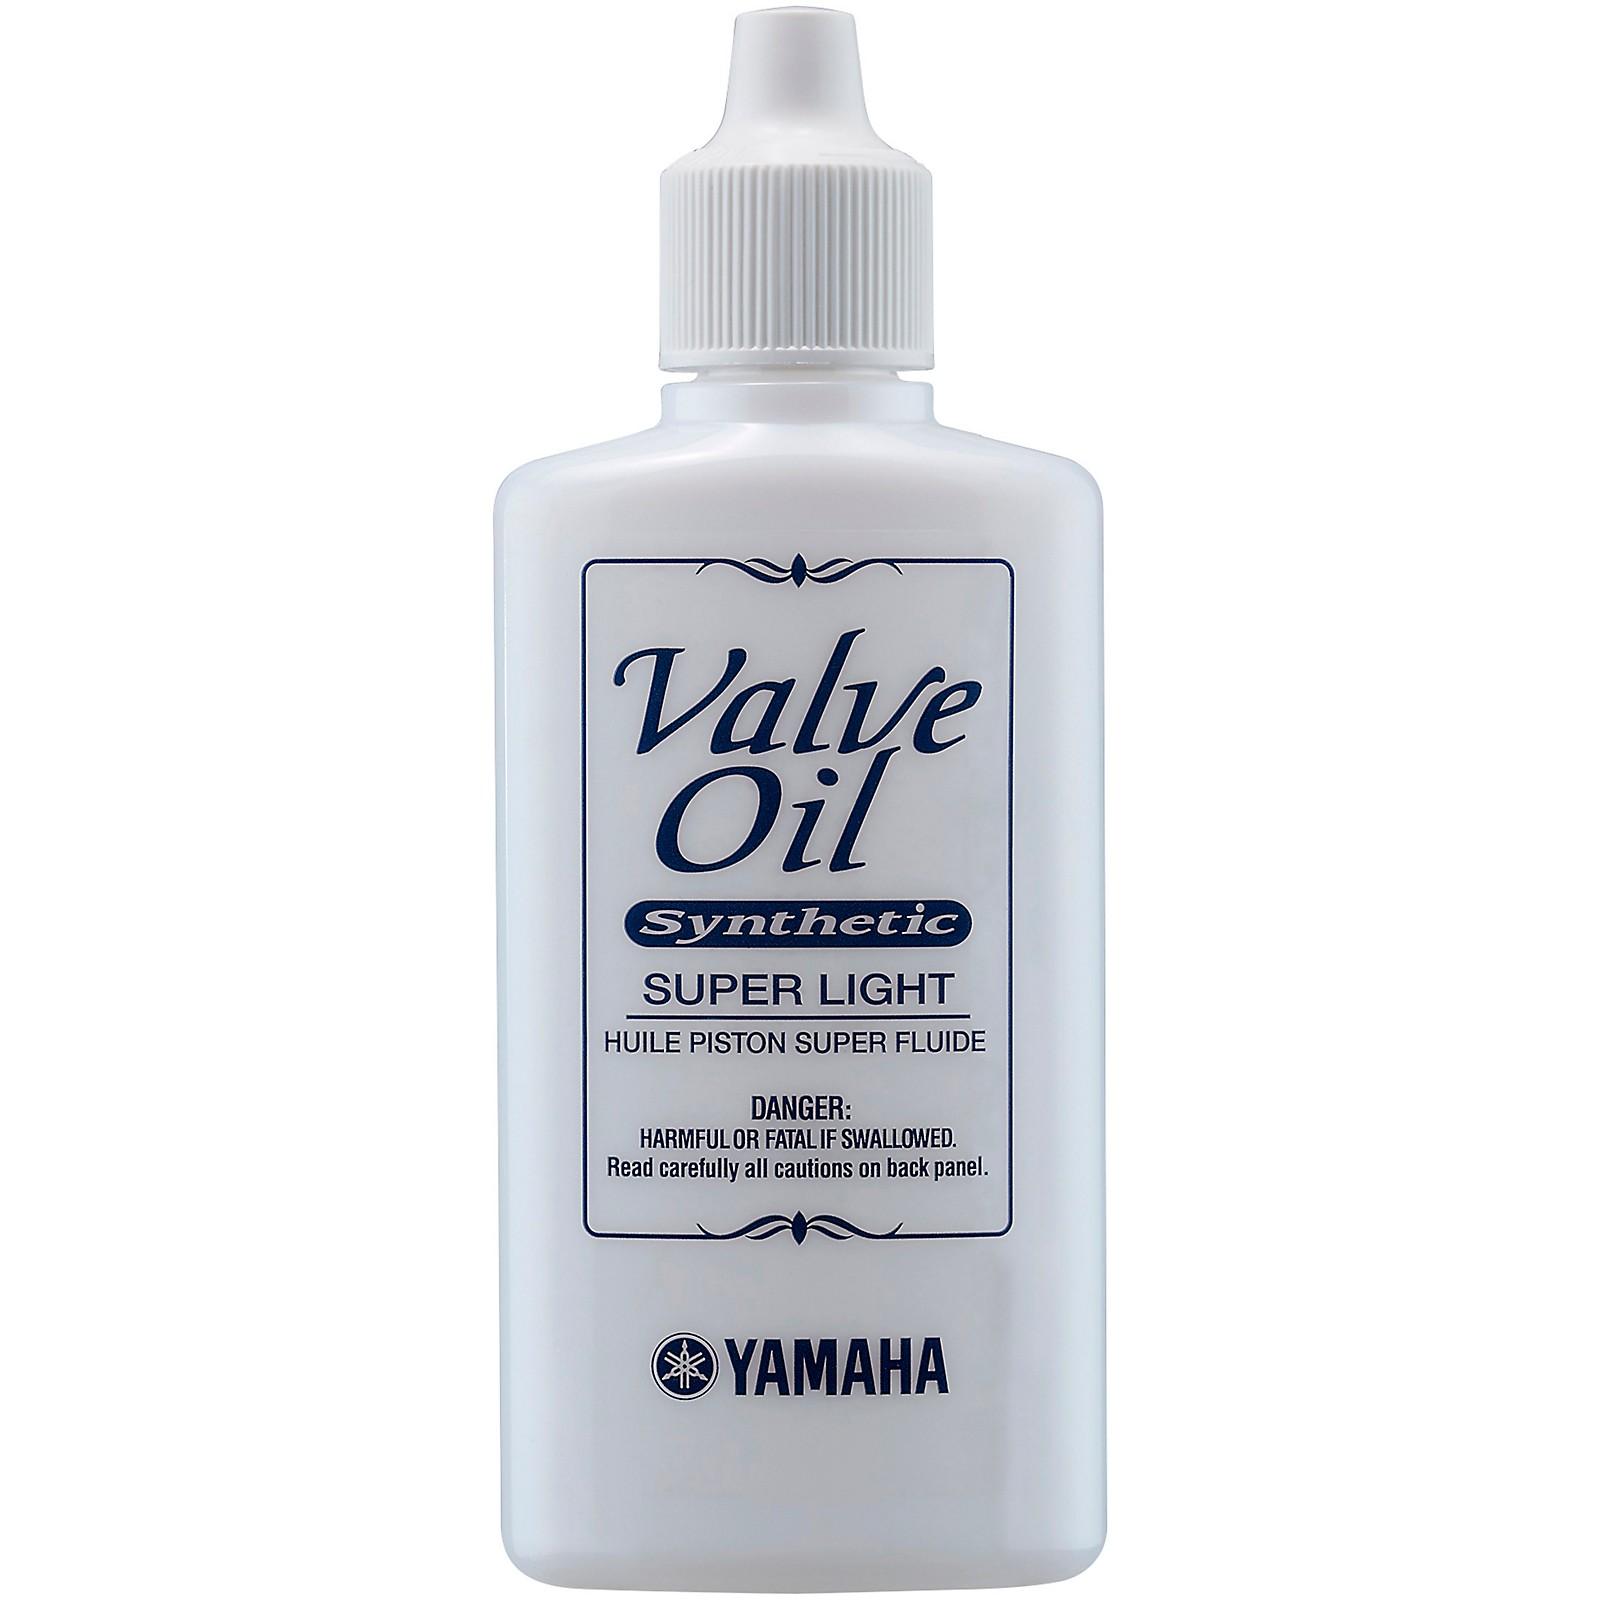 Yamaha Super Light Synthetic Valve Oil, 60mL